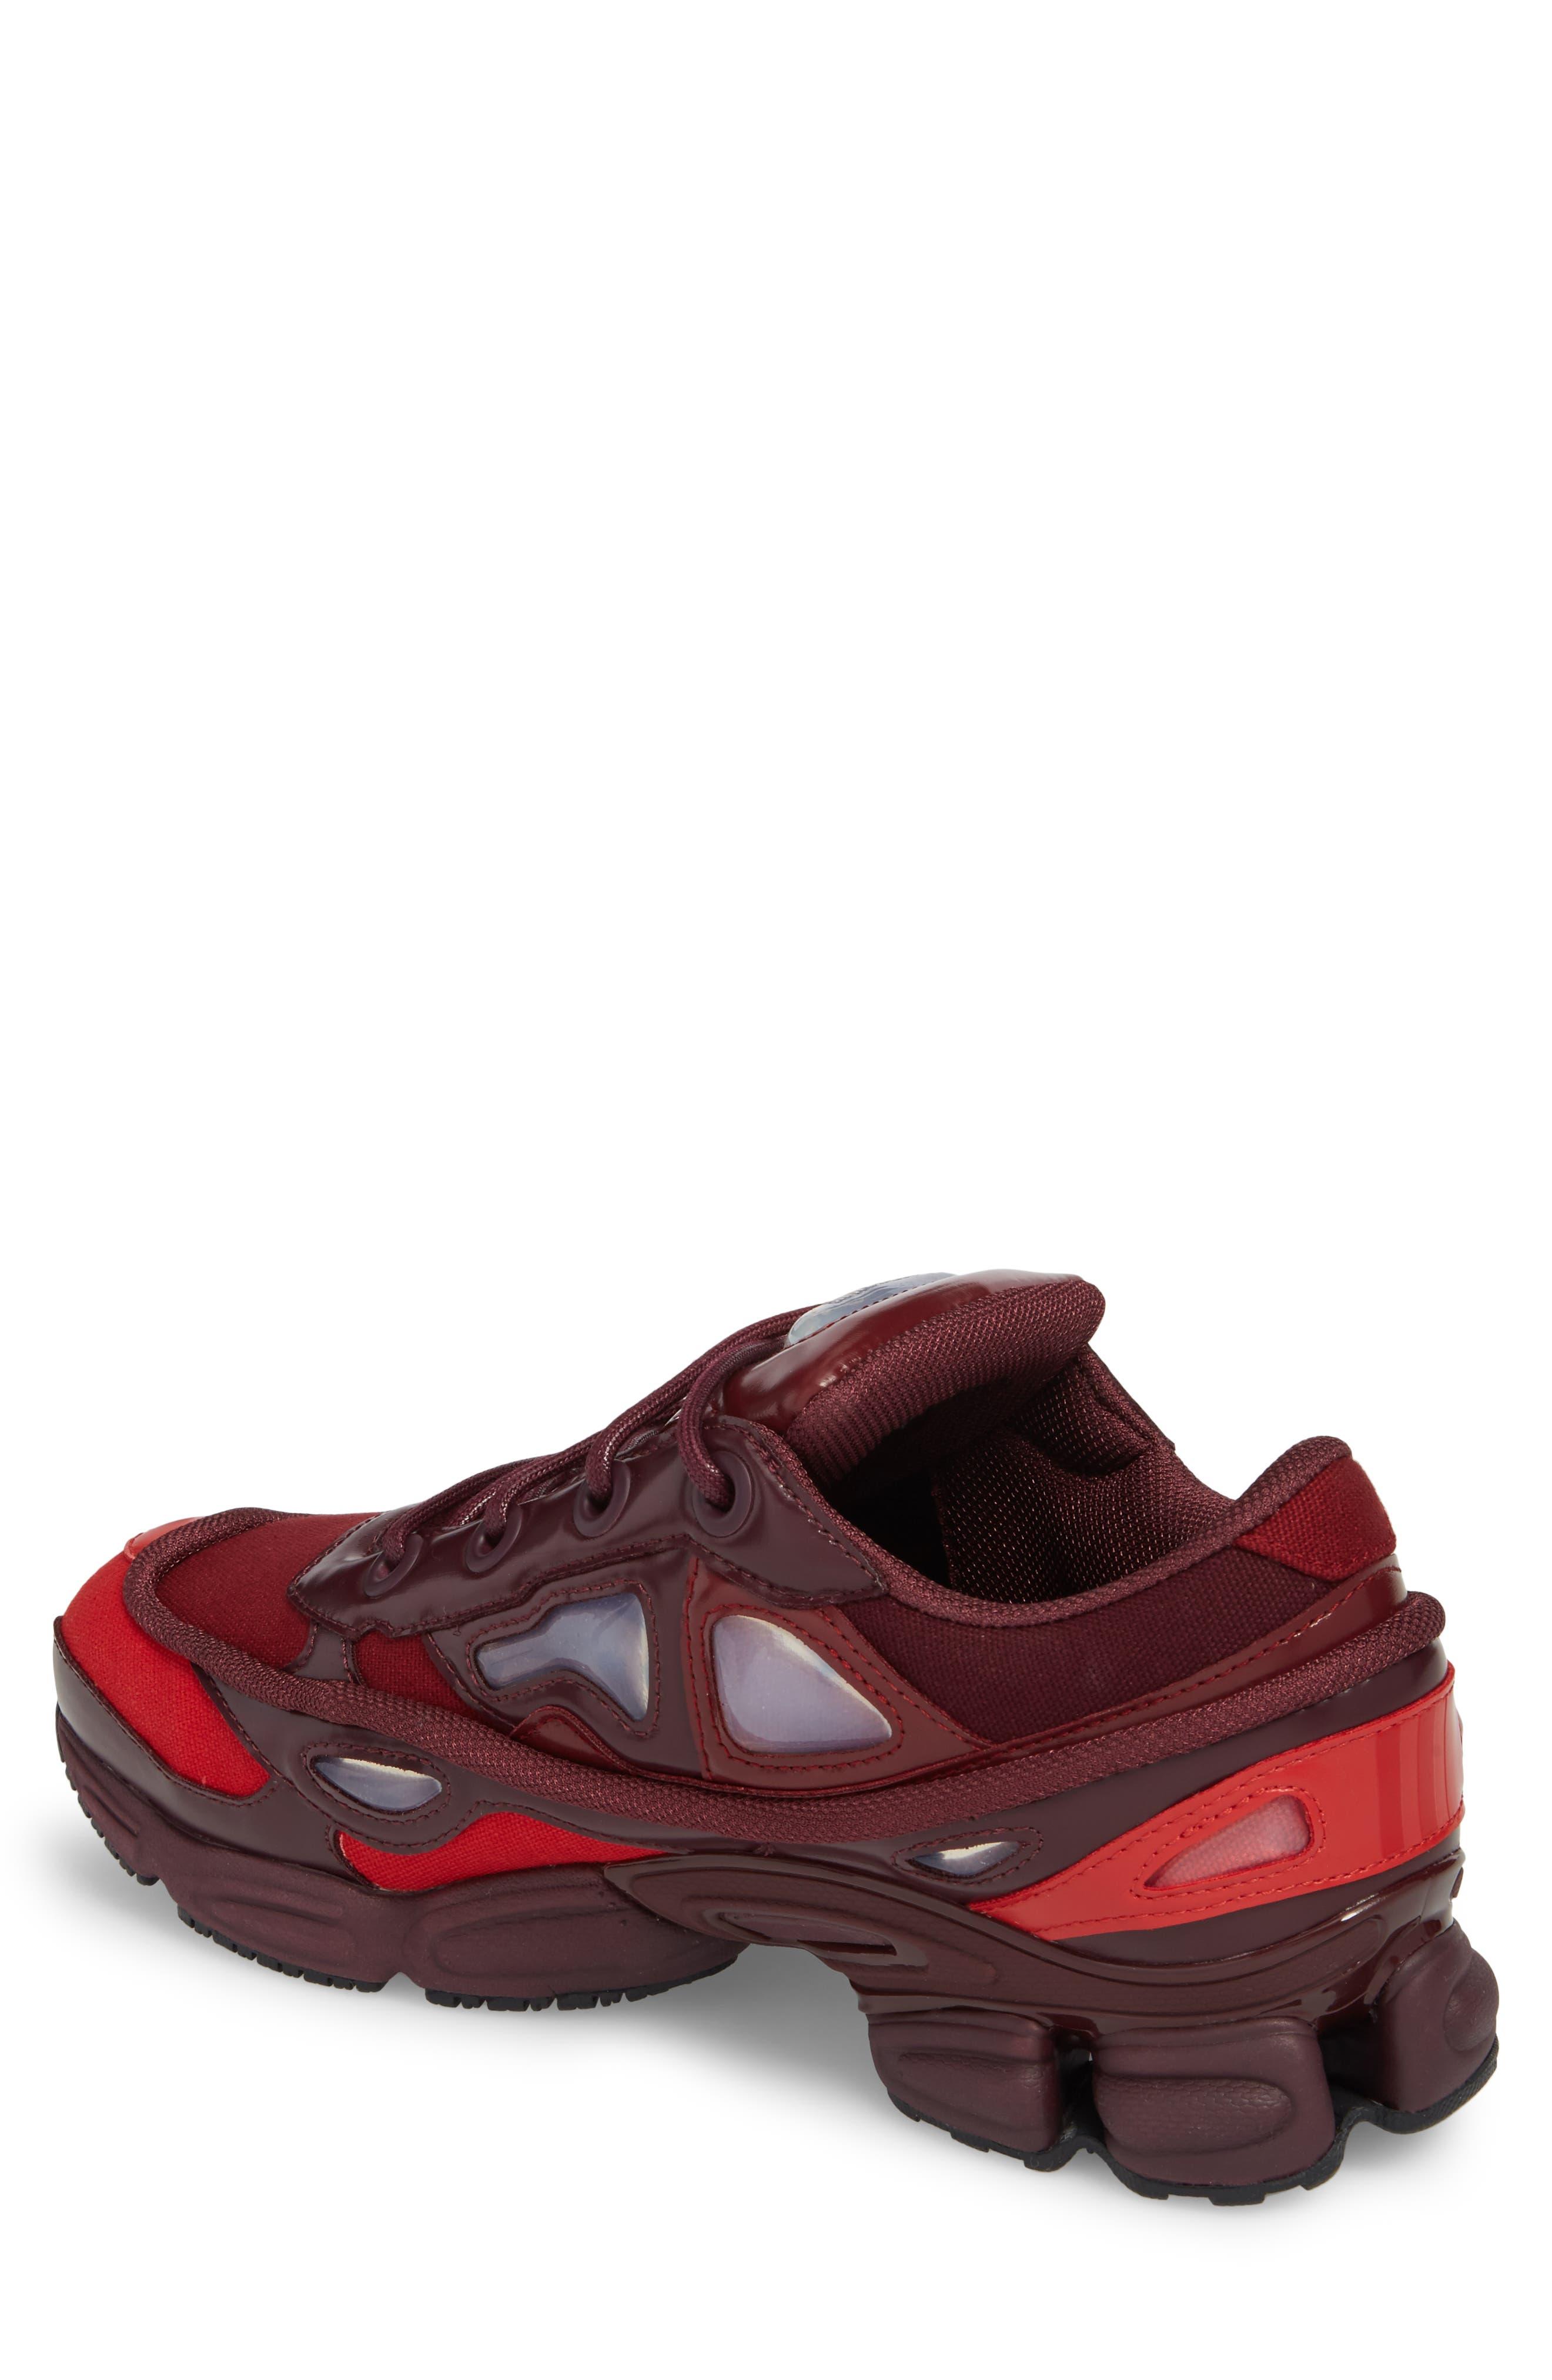 adidas by Raf Simons Ozweego III Sneaker,                             Alternate thumbnail 2, color,                             Burgundy/ Maroon/ Scarlet